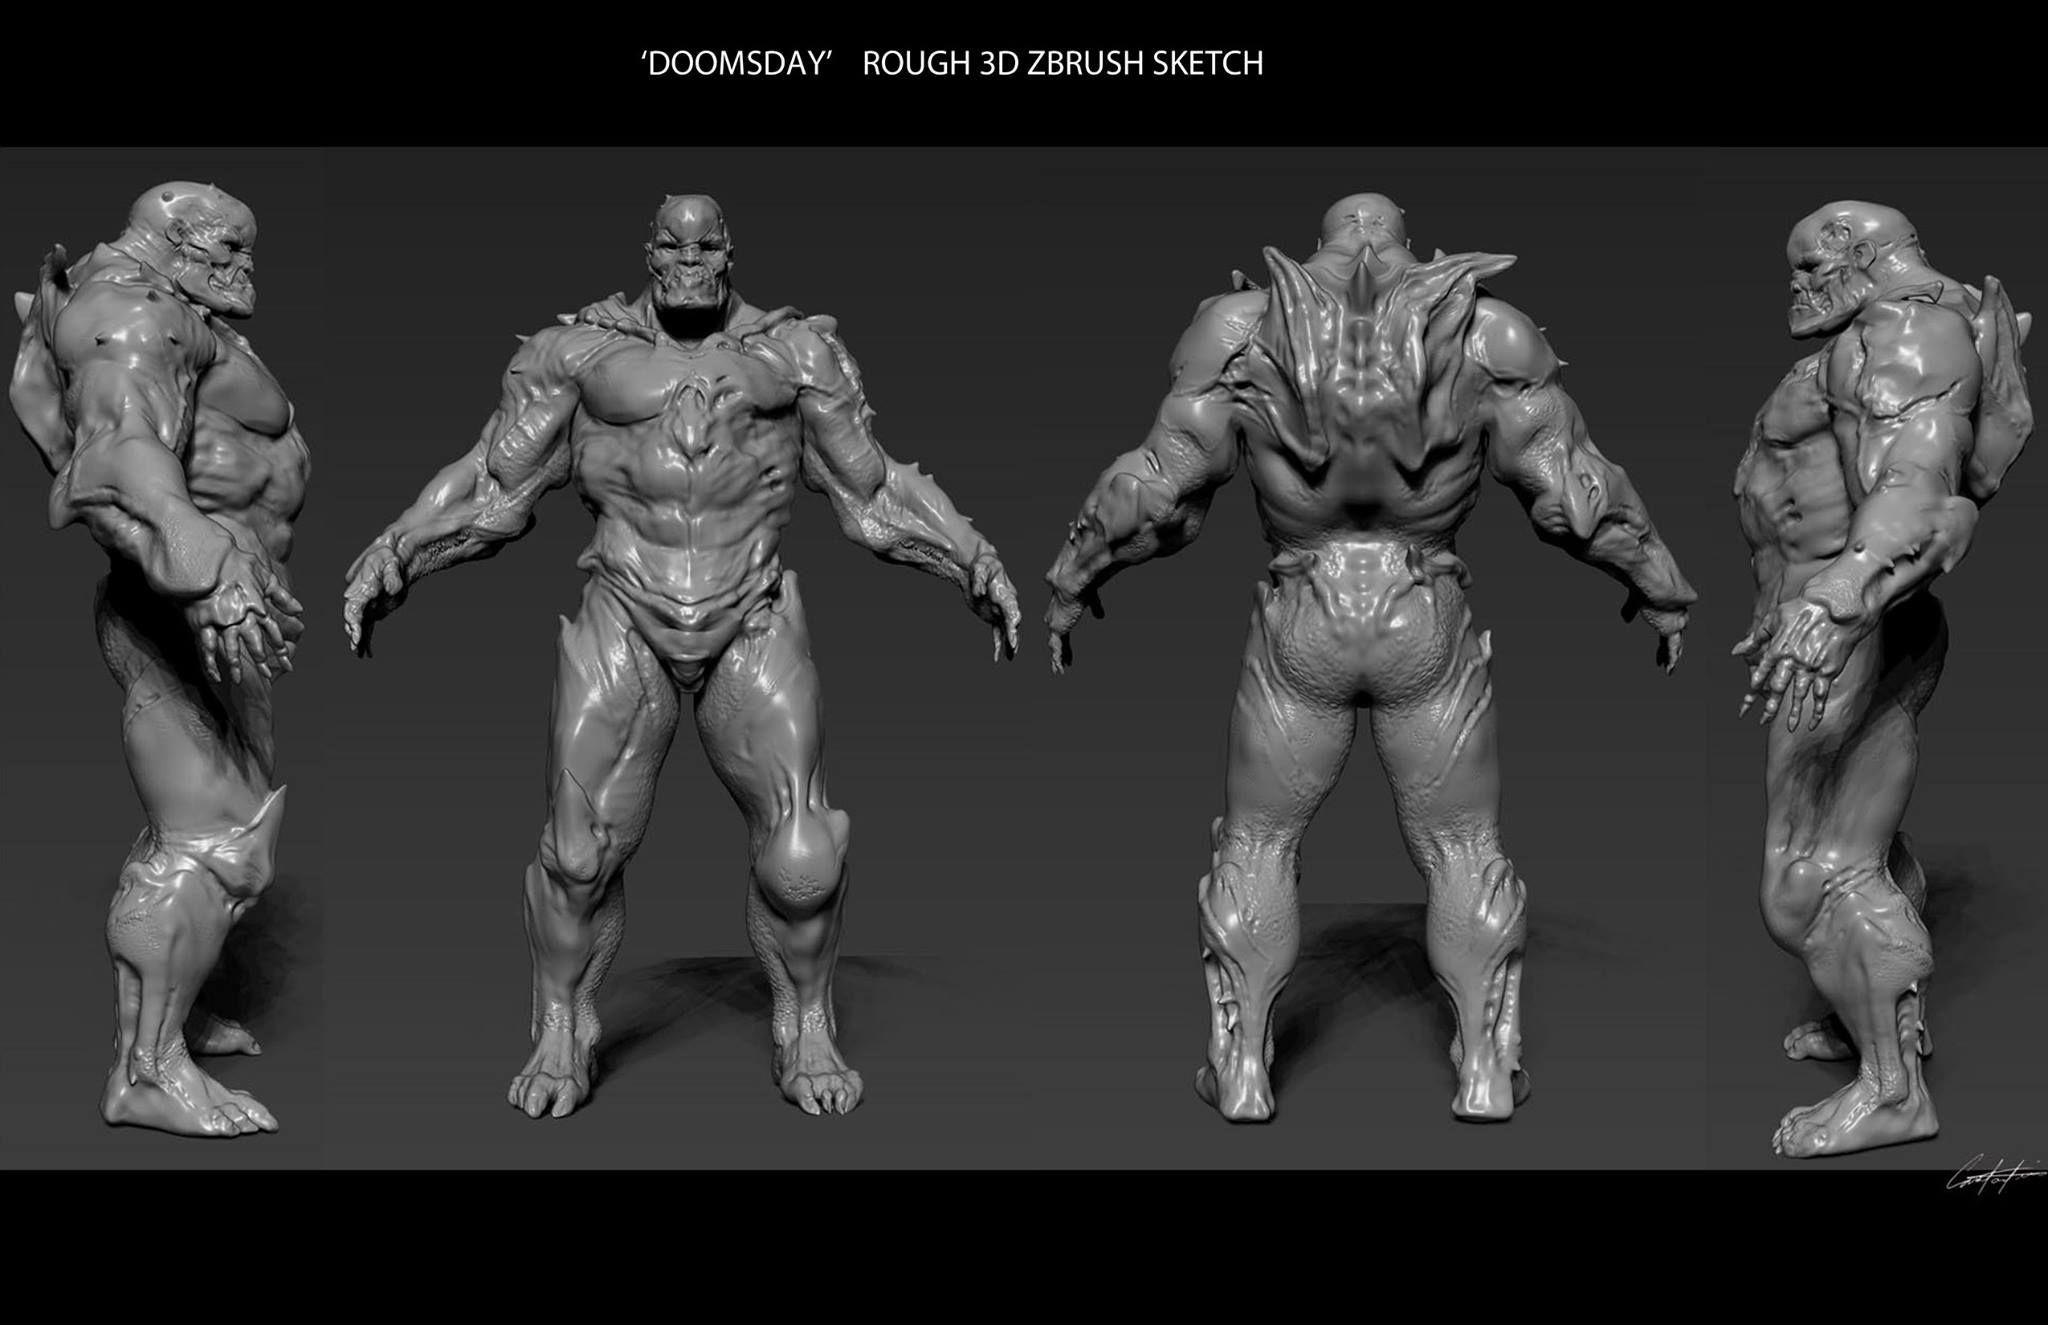 More Doomsday Wonder Woman Concept Art From Batman Vs